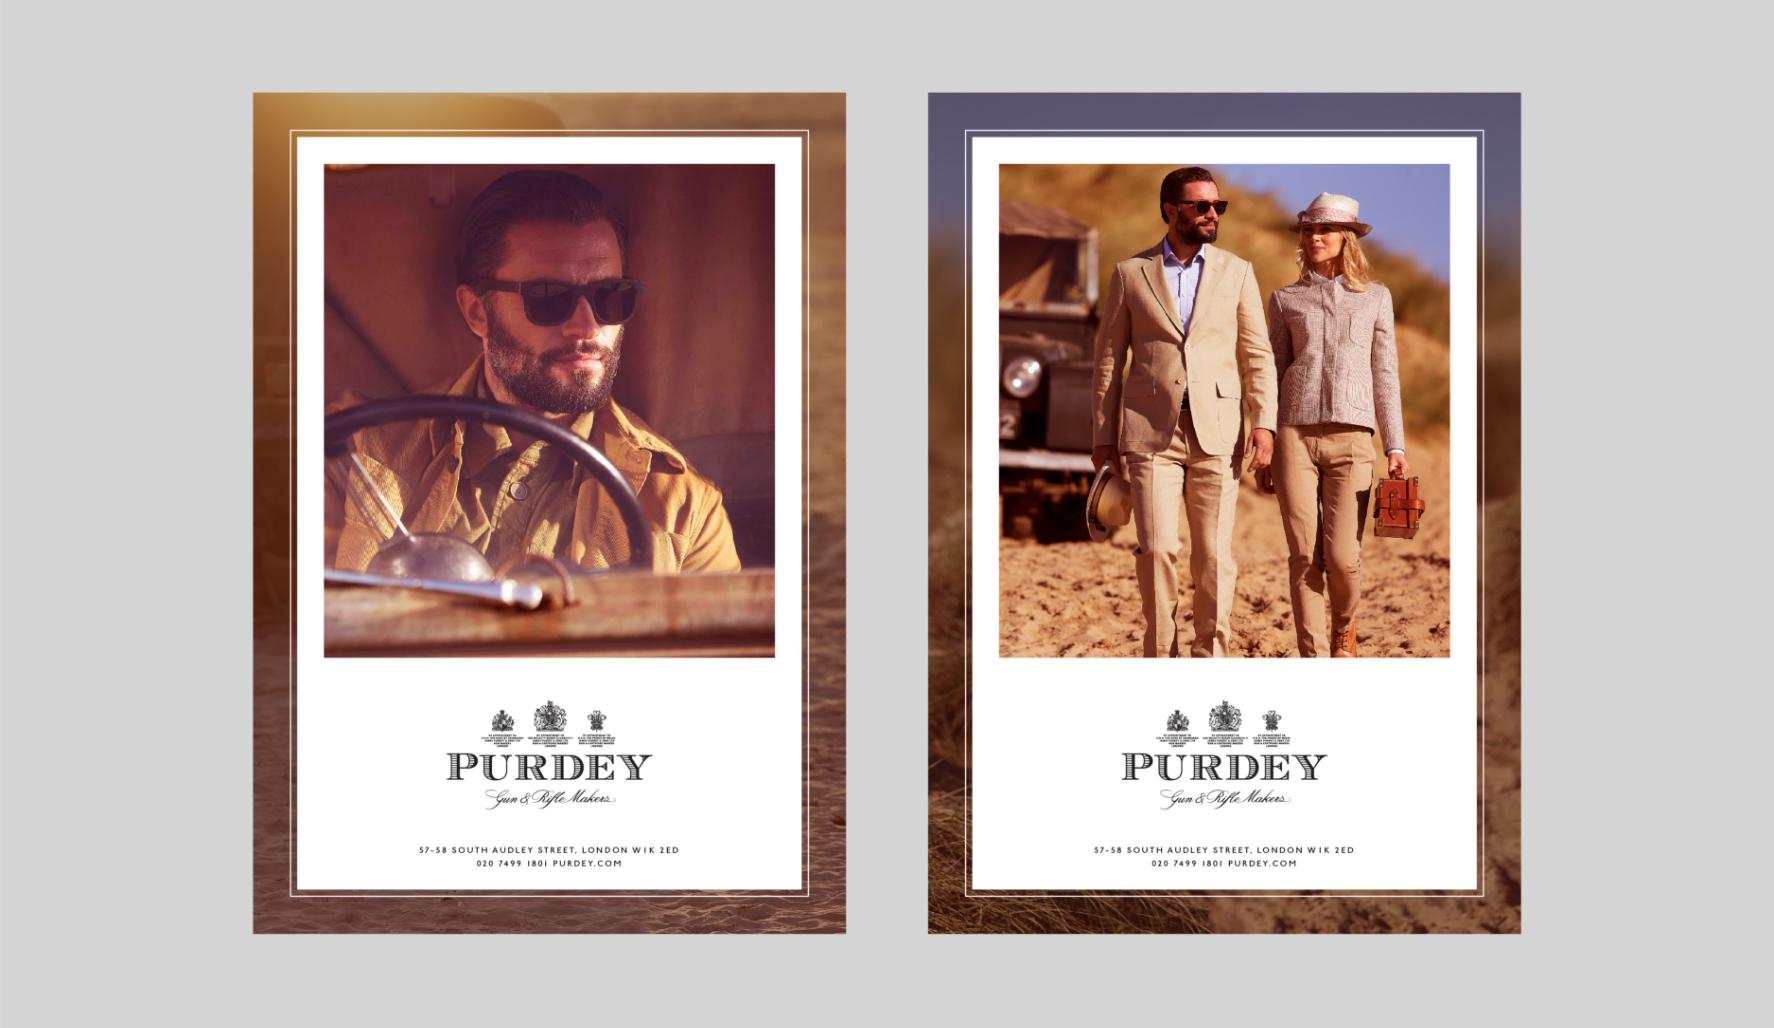 Purdey advertising